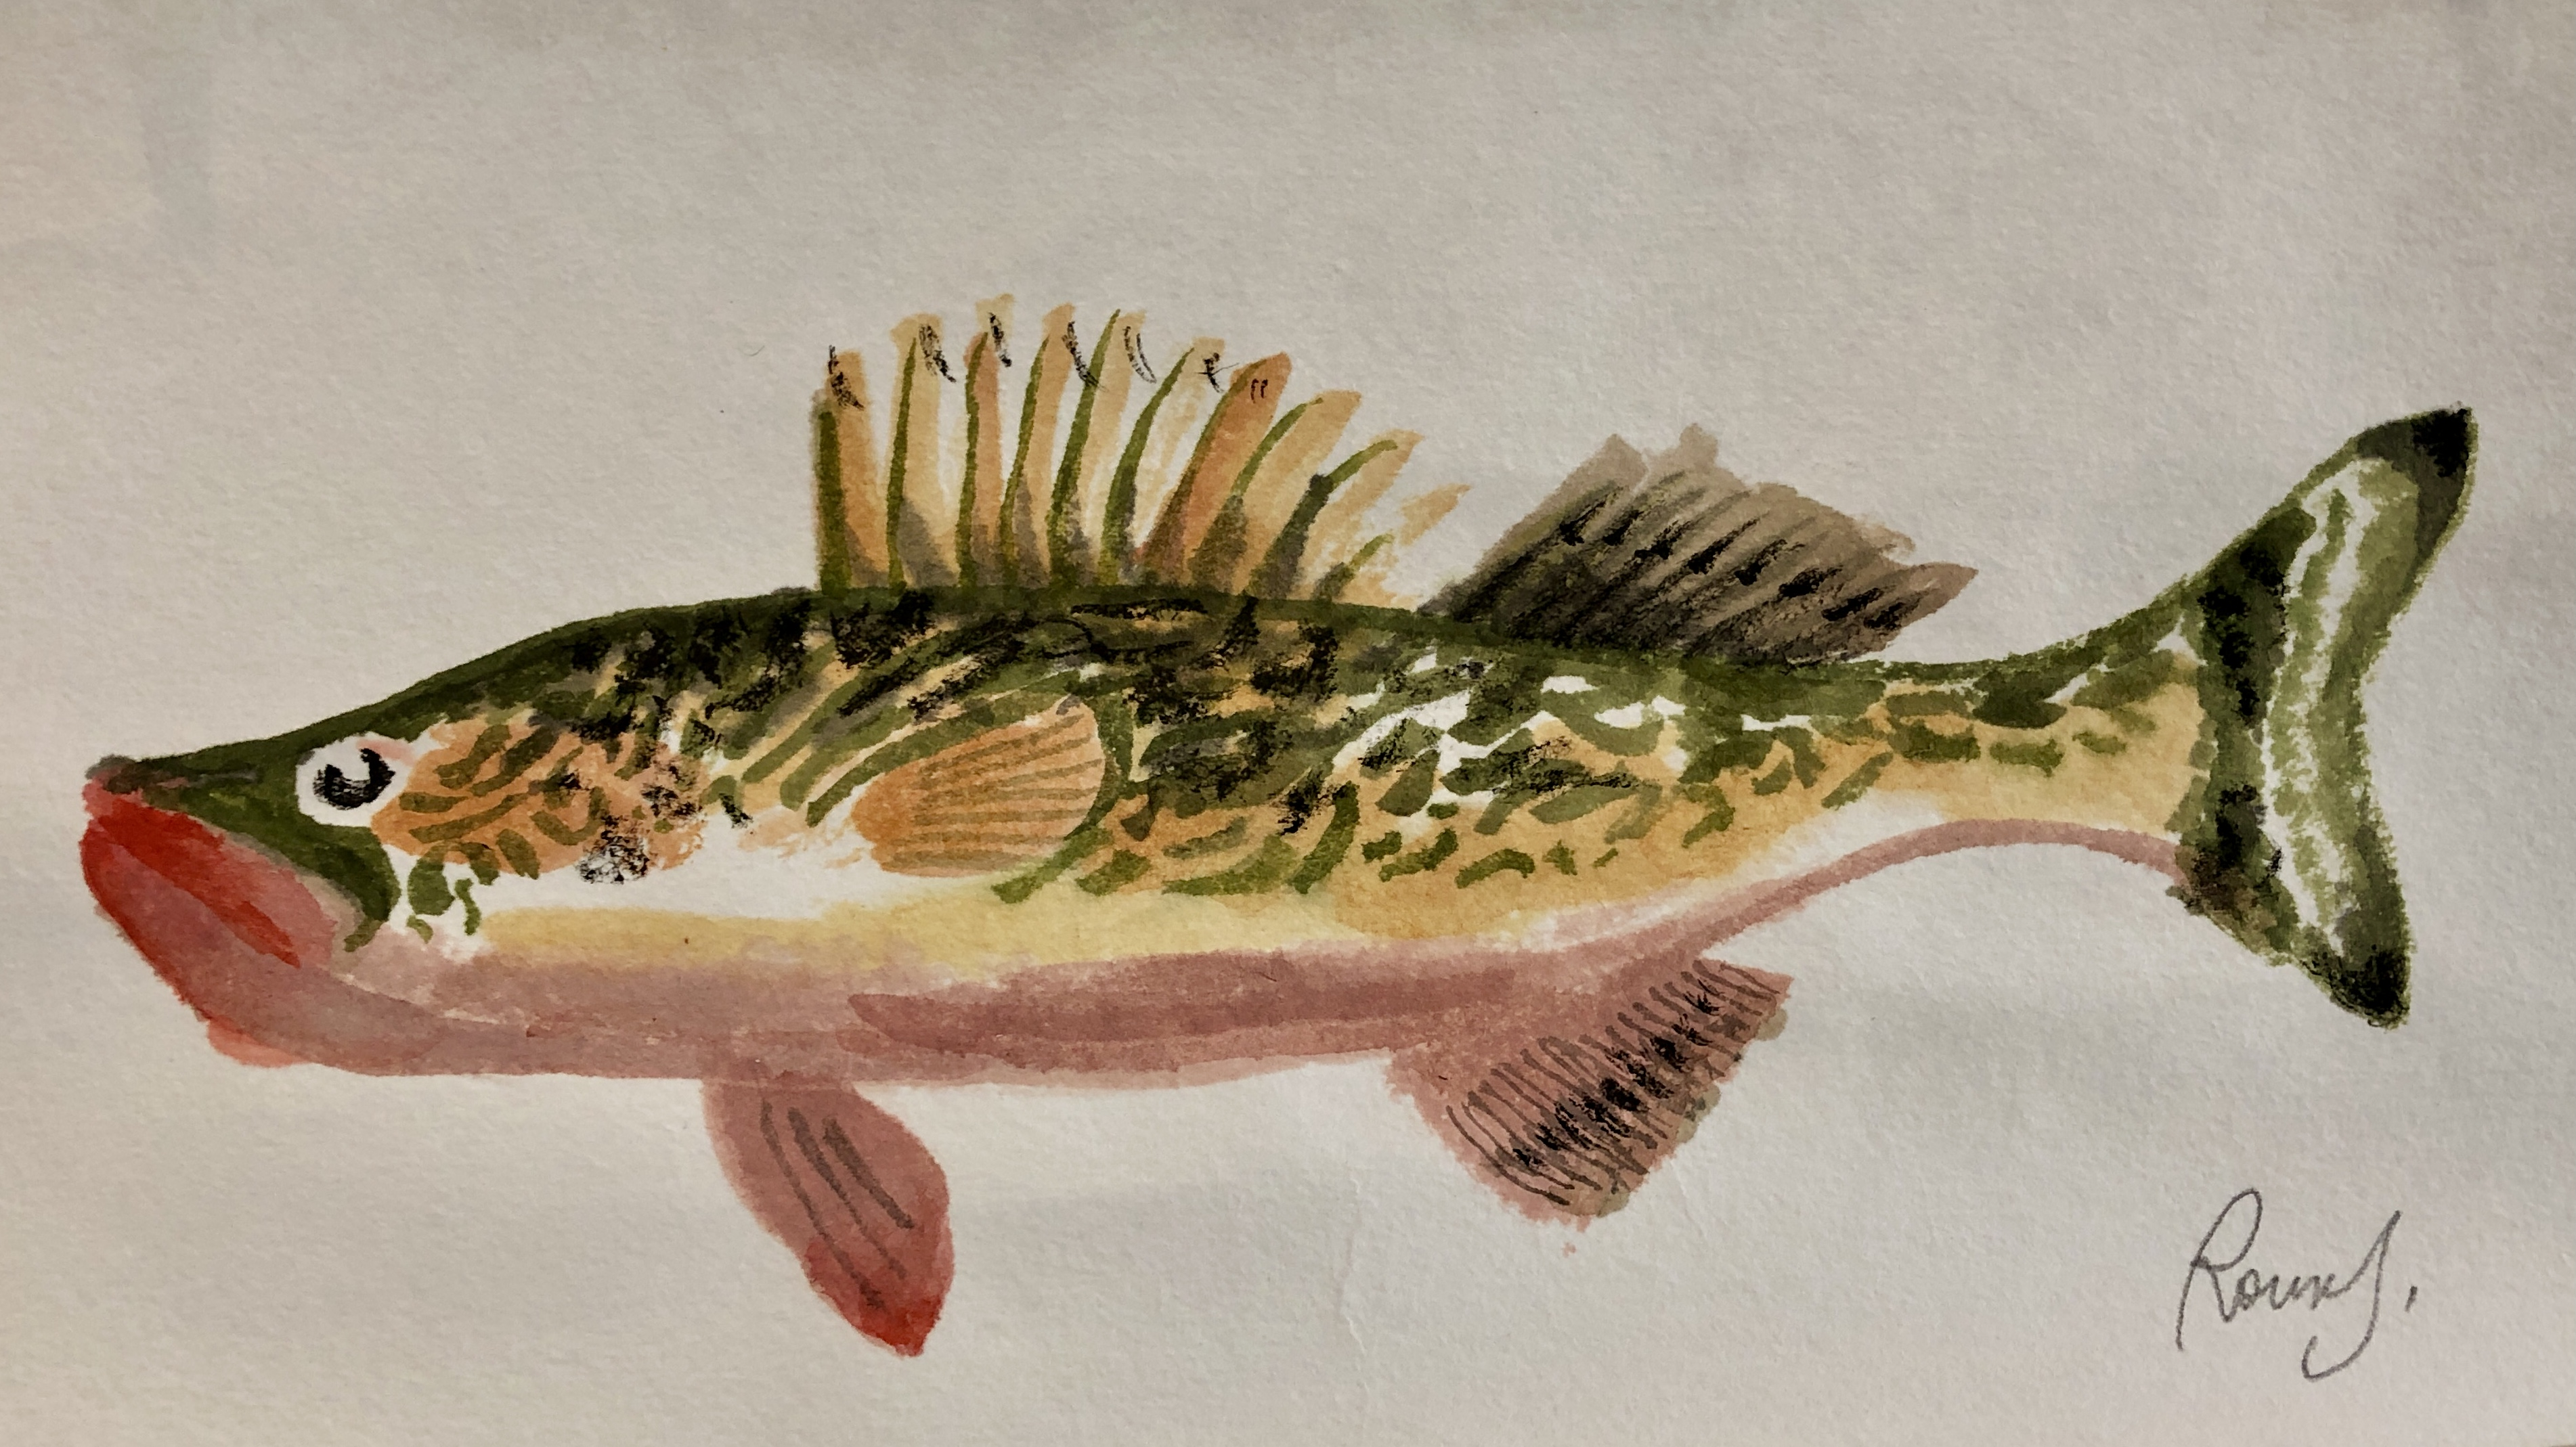 Fish 34, 2020, Tinte, Gouache, Acryl auf Japanpapier, 15 x 20 cm